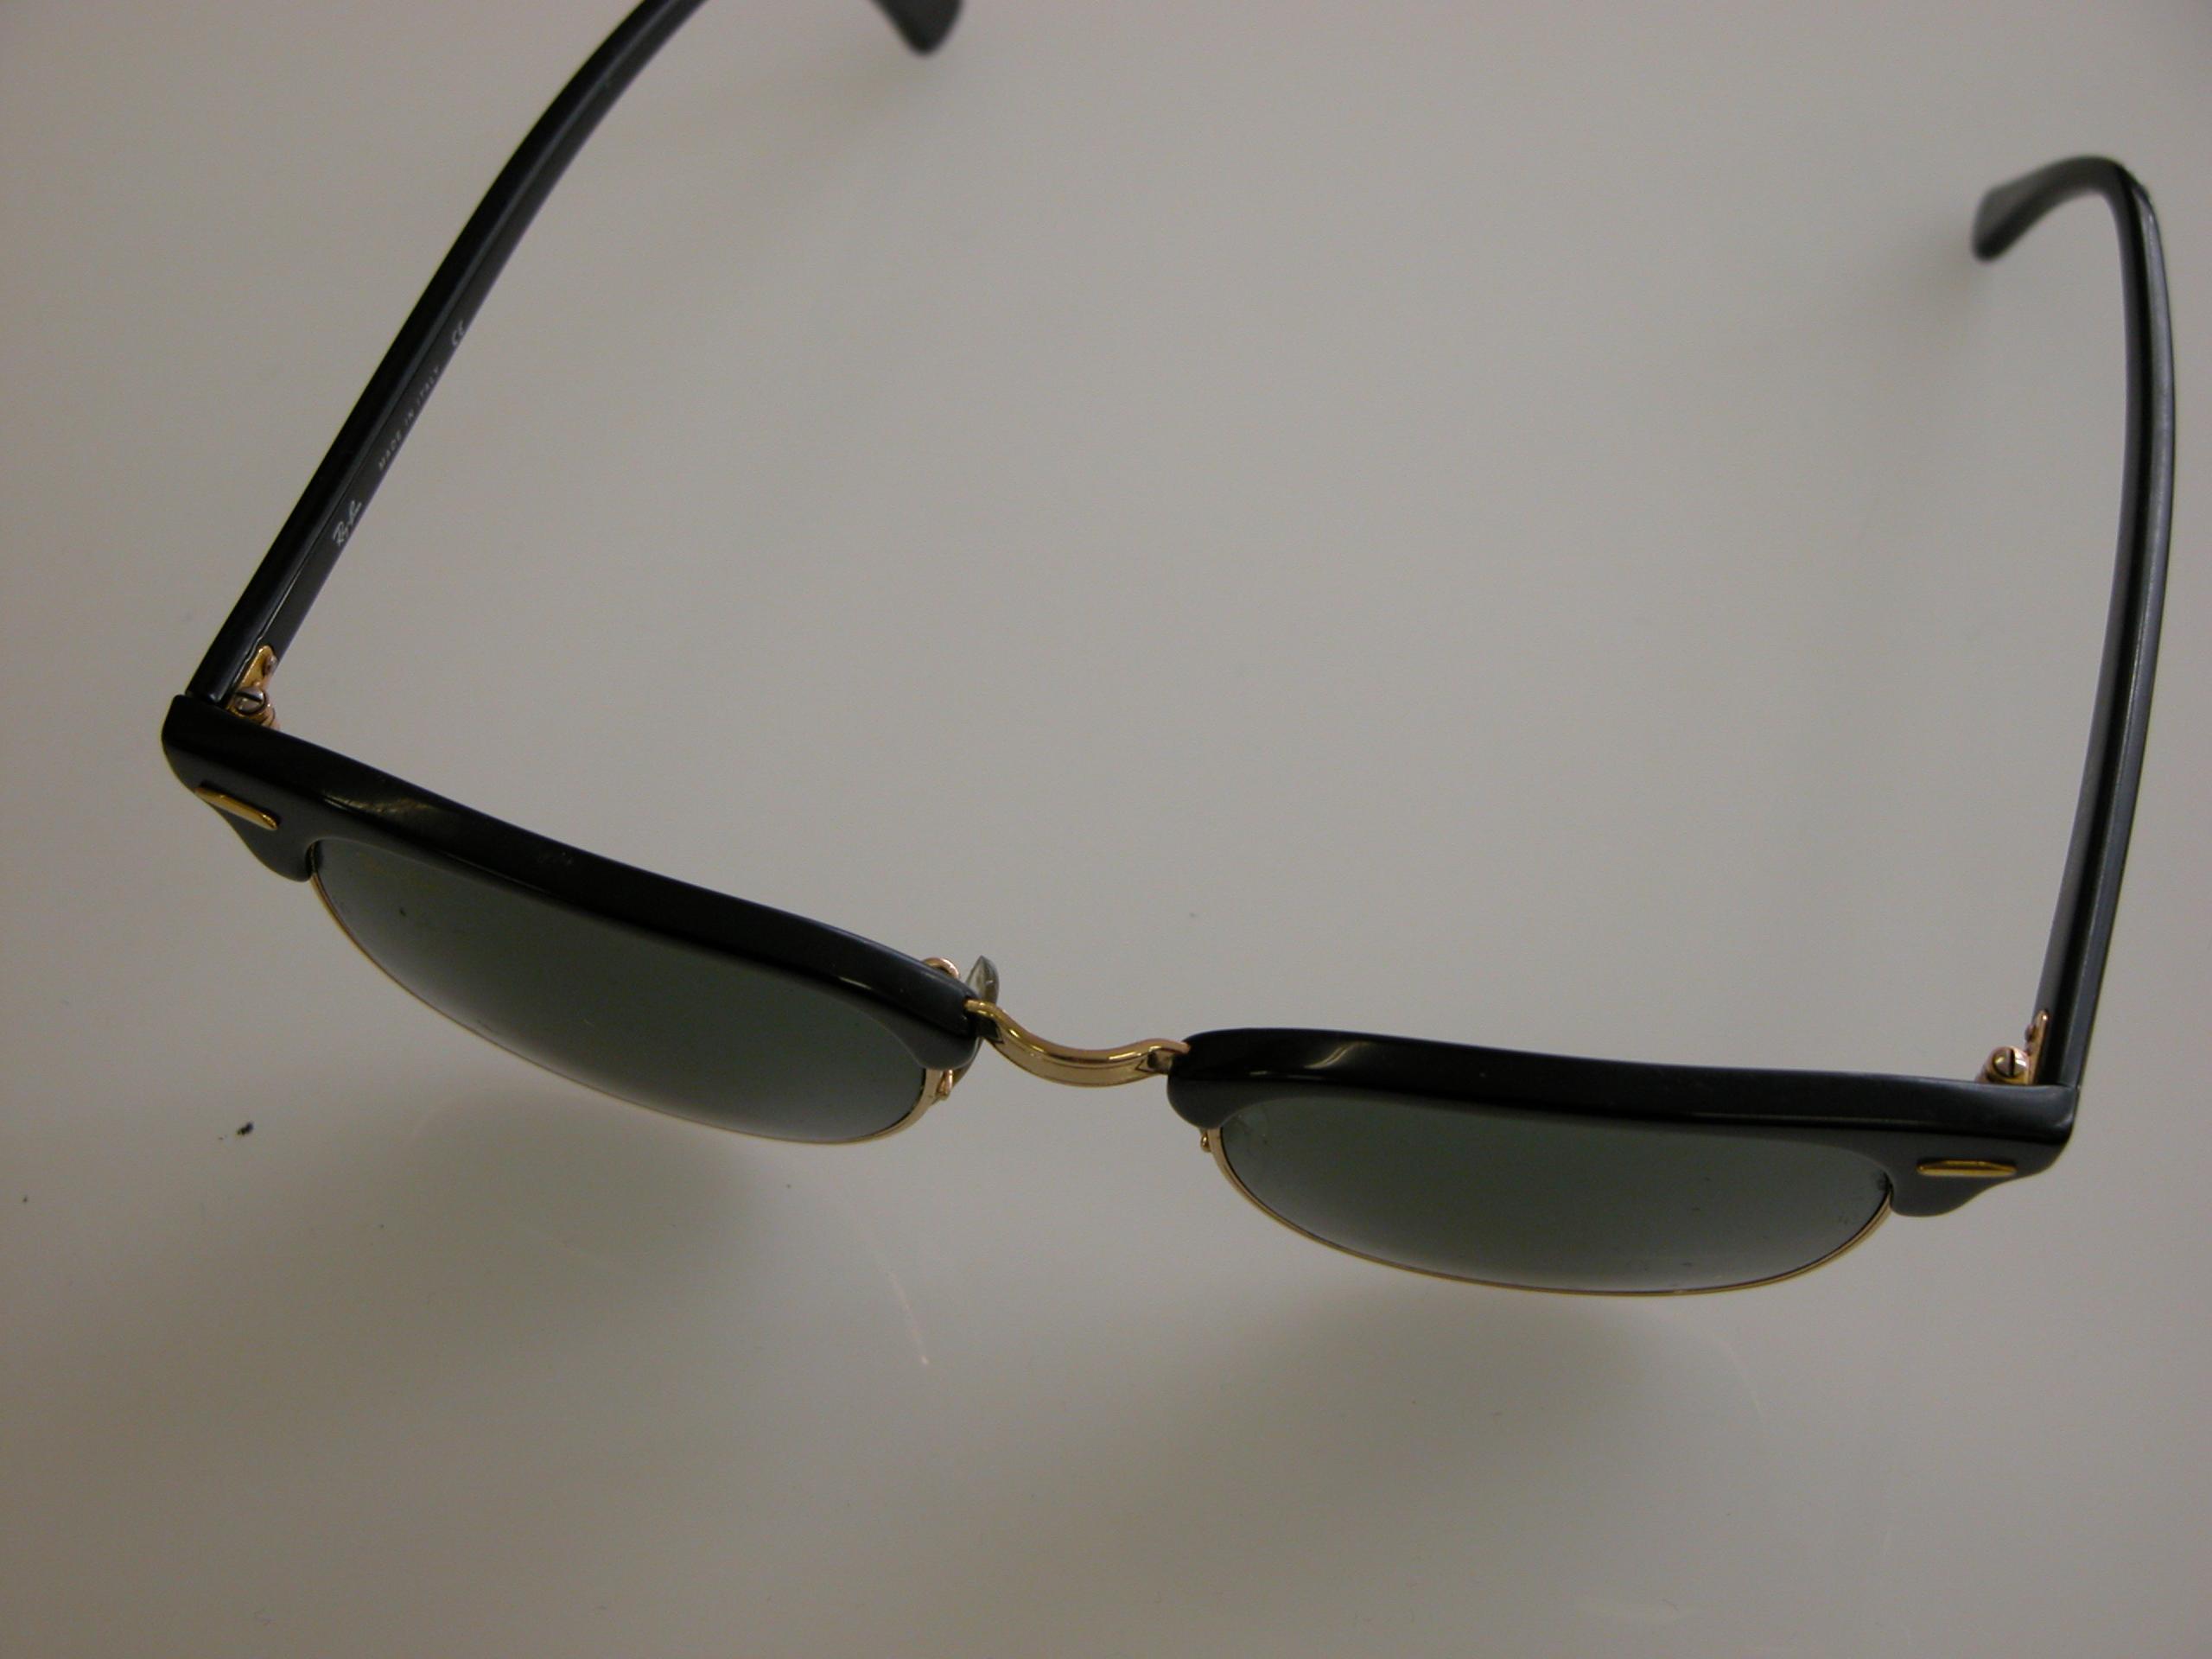 sunglasses sun spectacles black uv cool